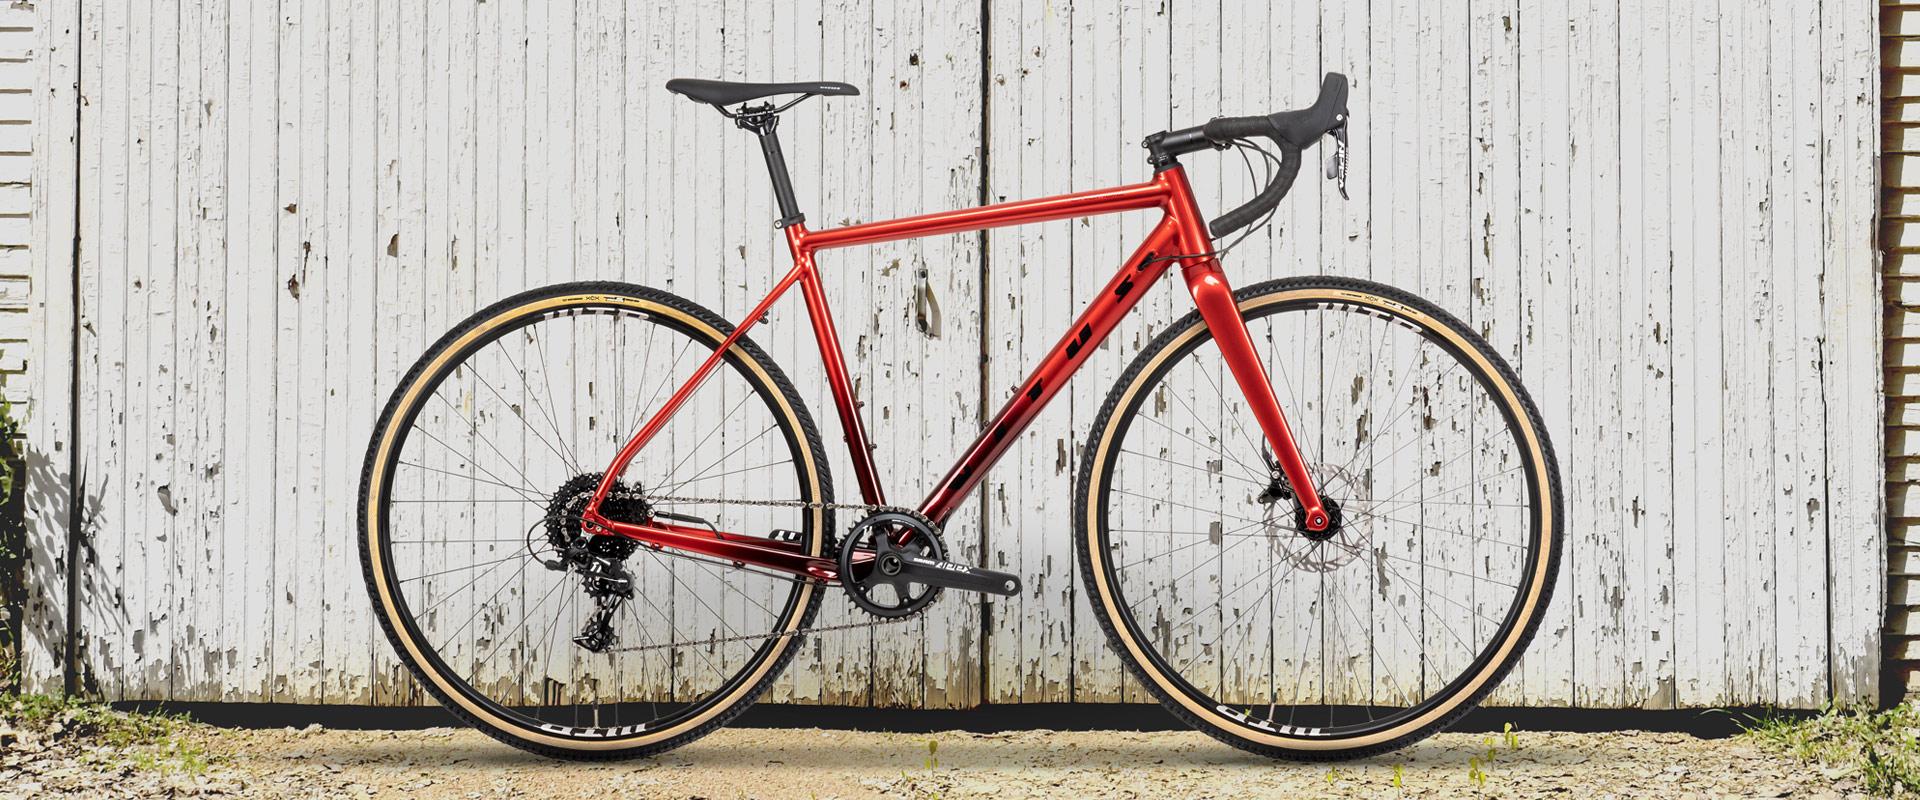 Vitus Energie VR Cyclocross Bike Apex